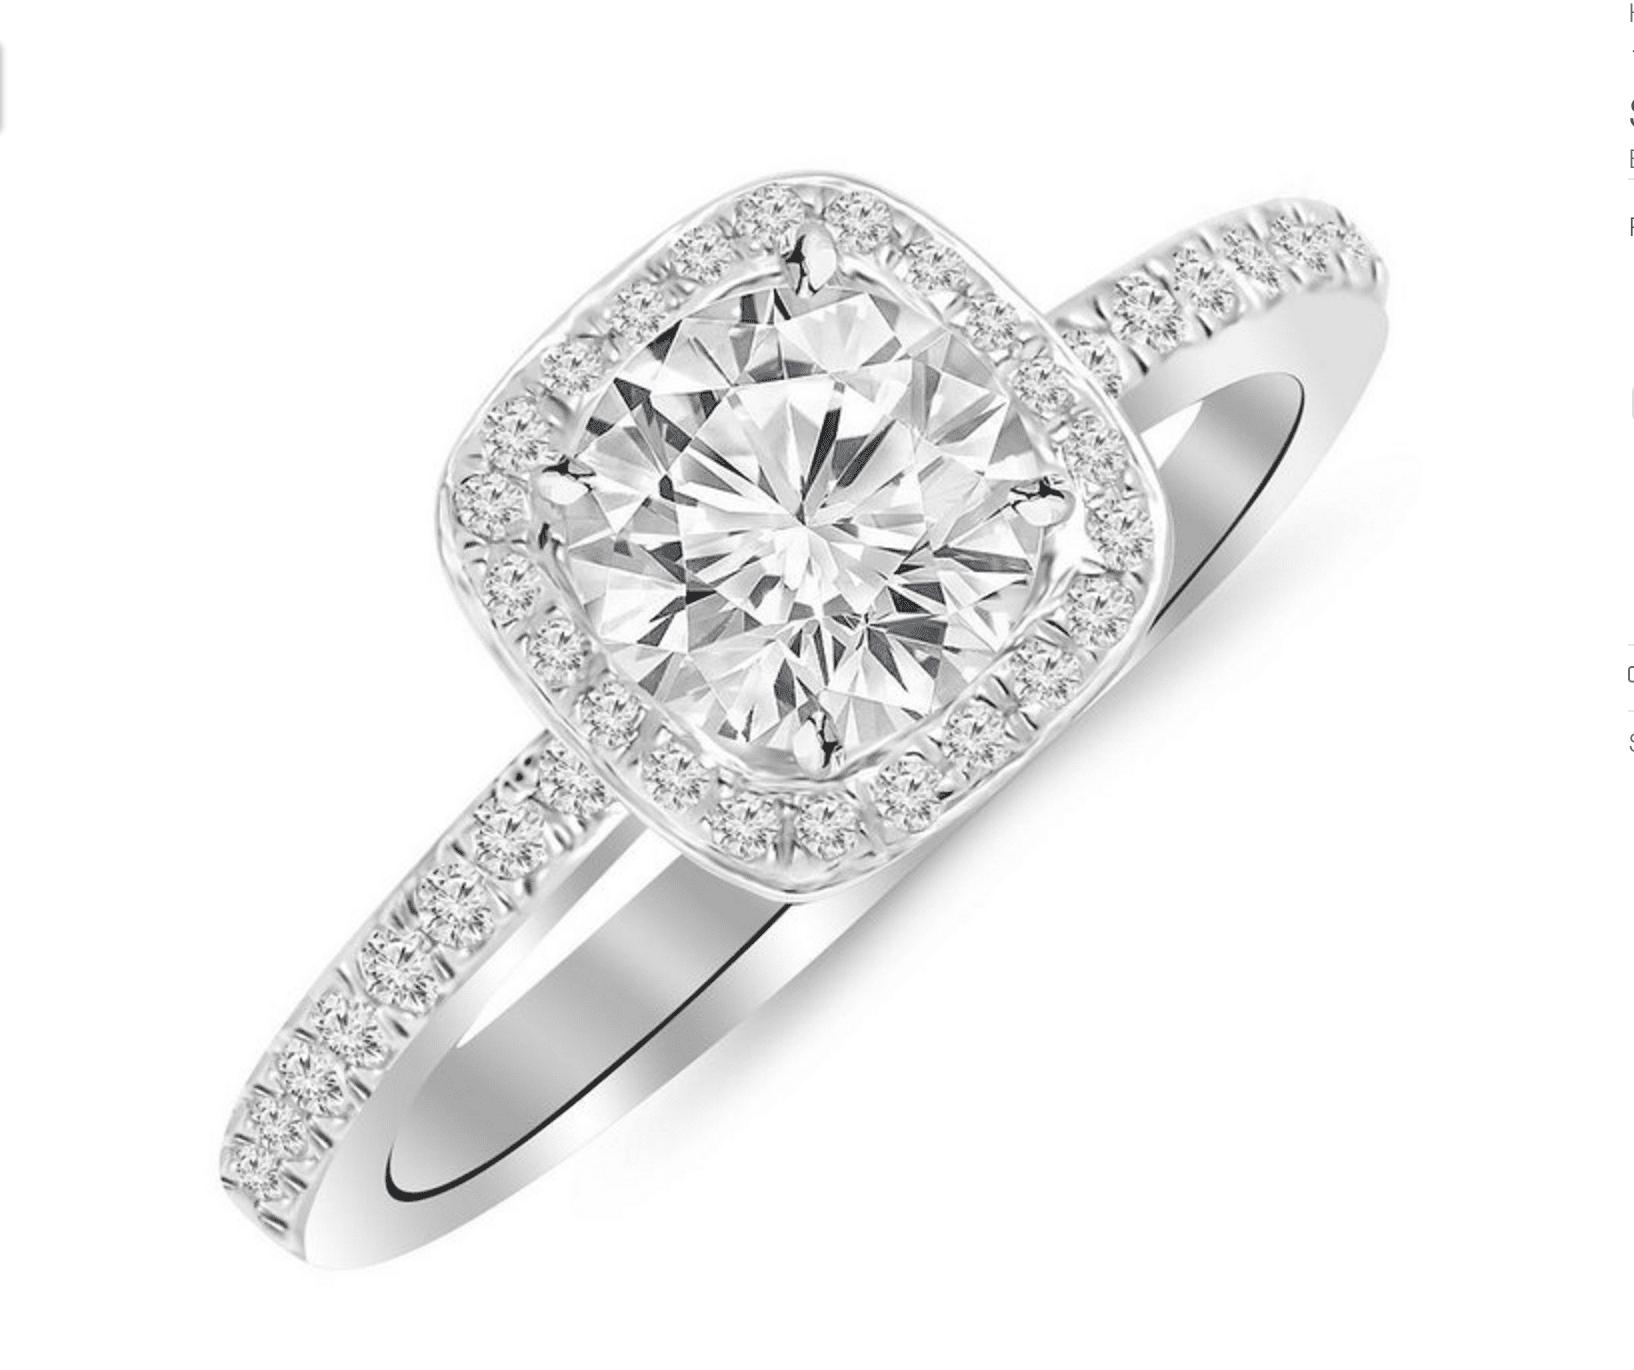 Fresh Wedding Rings Explained